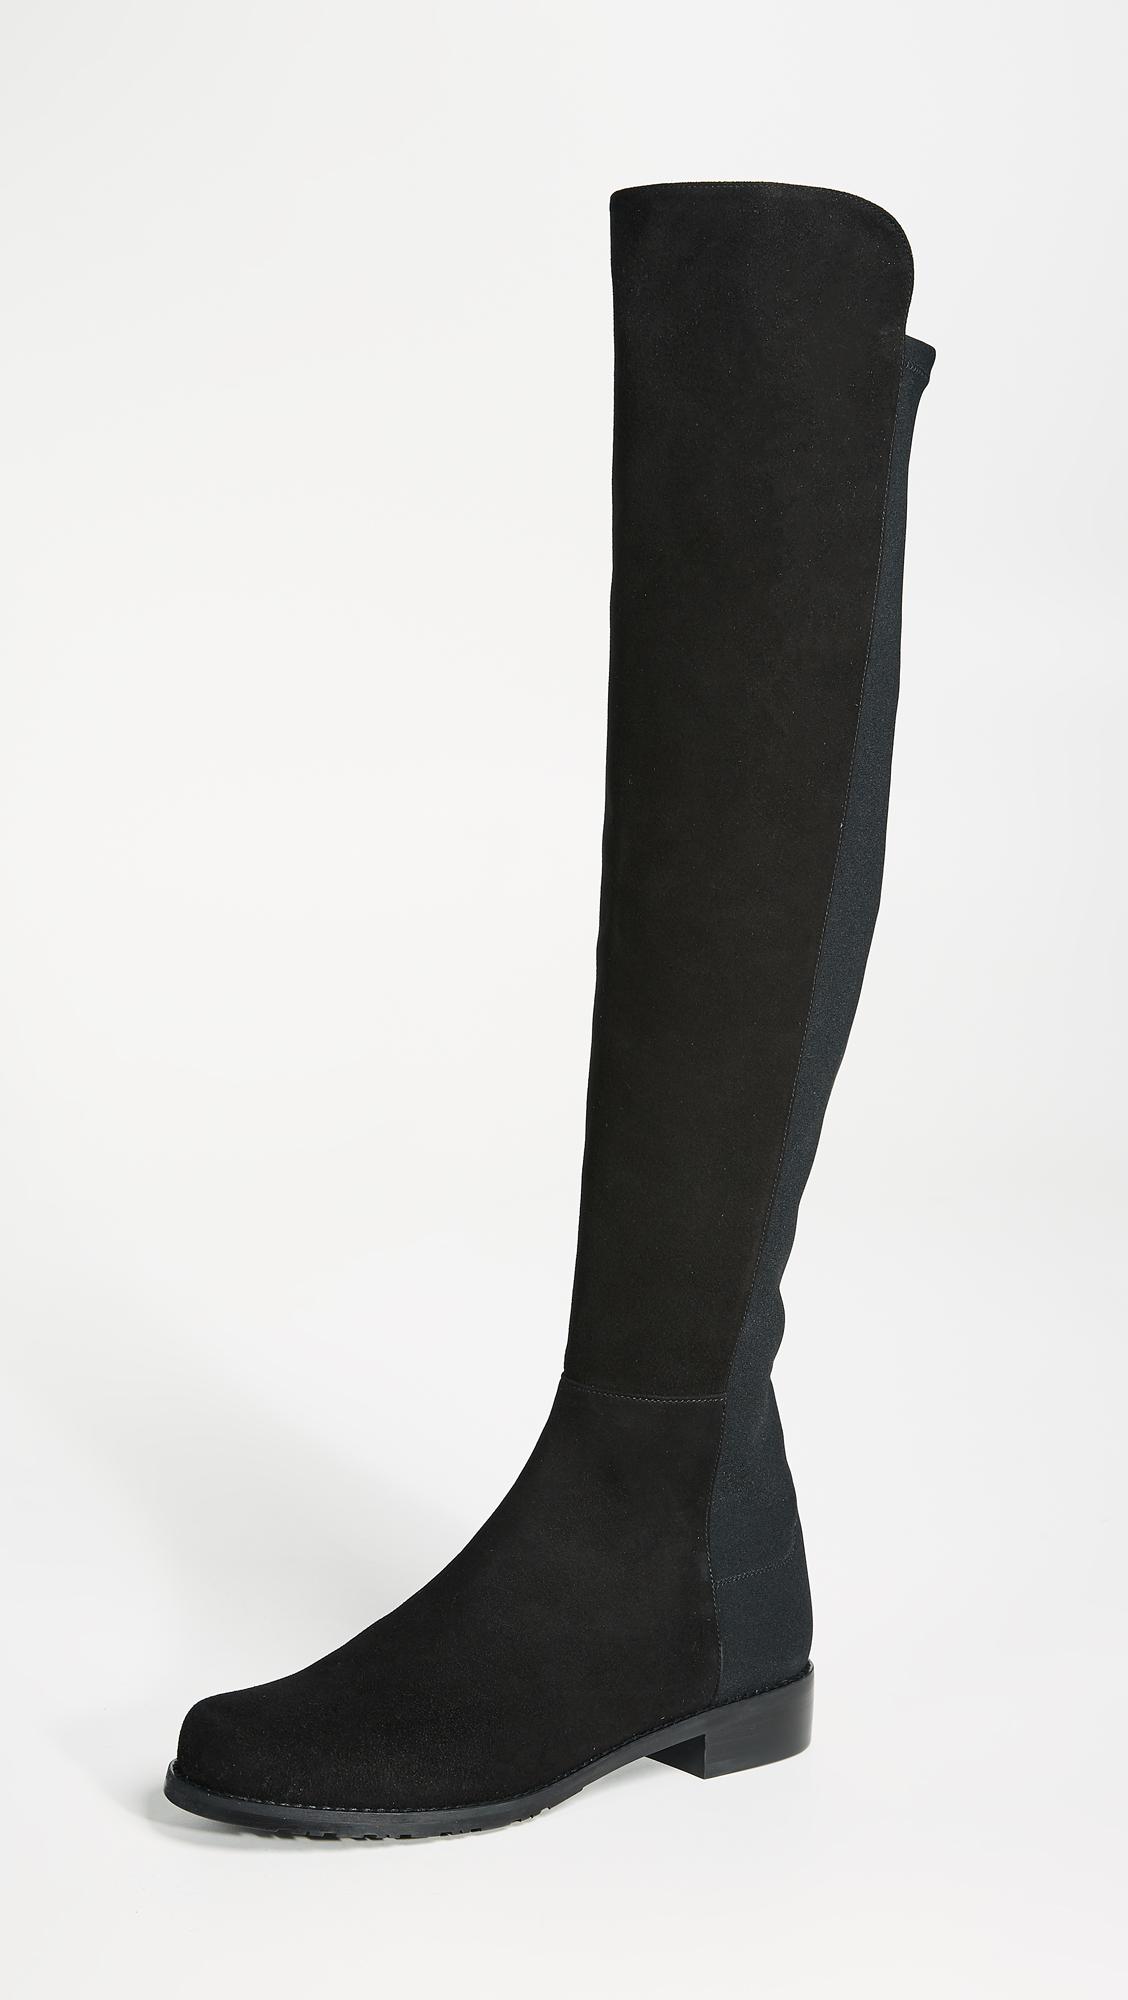 e8803bb3a630 Shop Women s Designer Boots Online